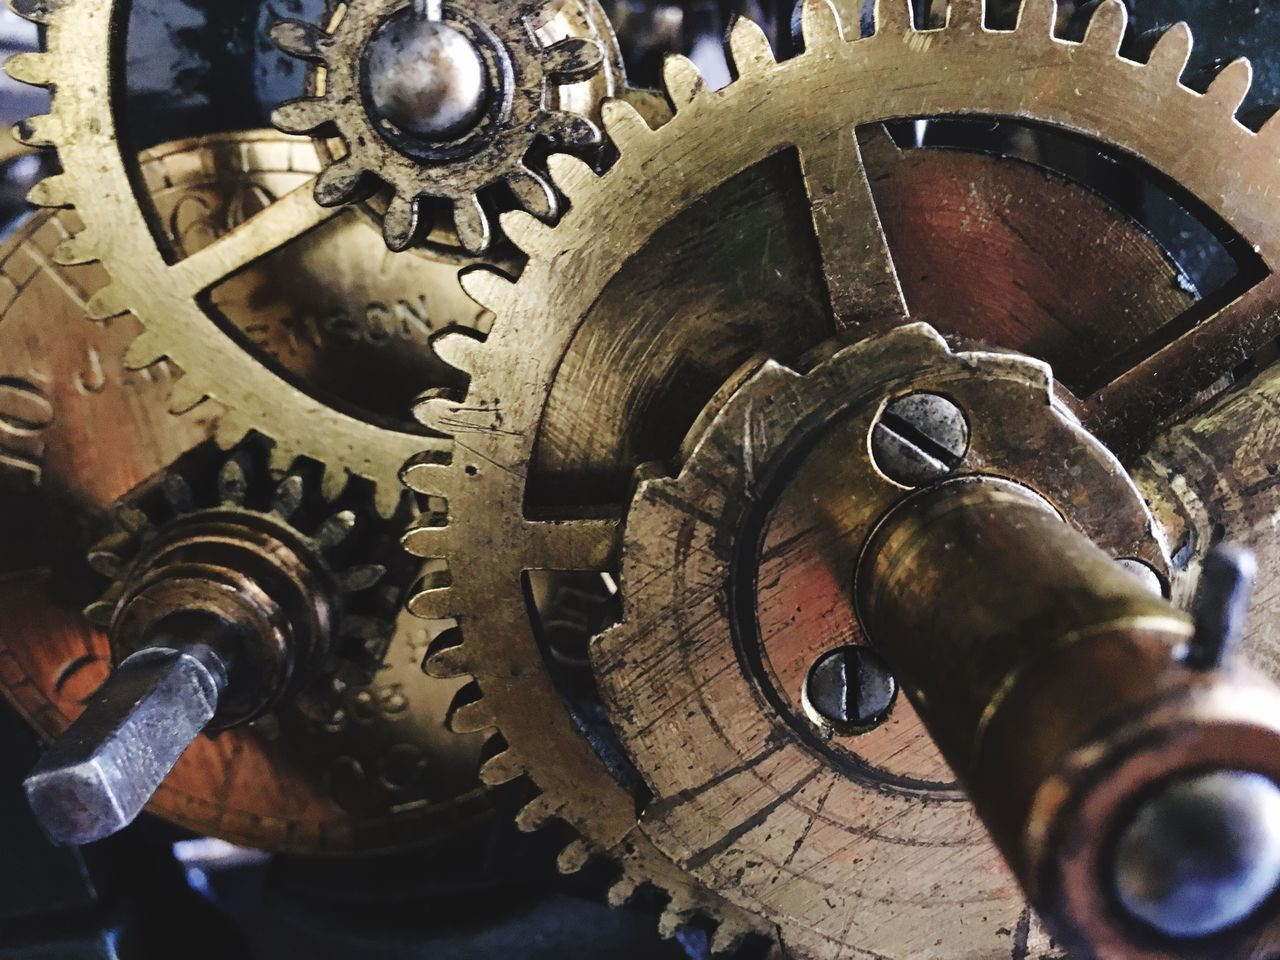 Maximum Closeness Clock Old Clock Brass Machine Gear The Netherlands Time Second Ticking Close Up Technology